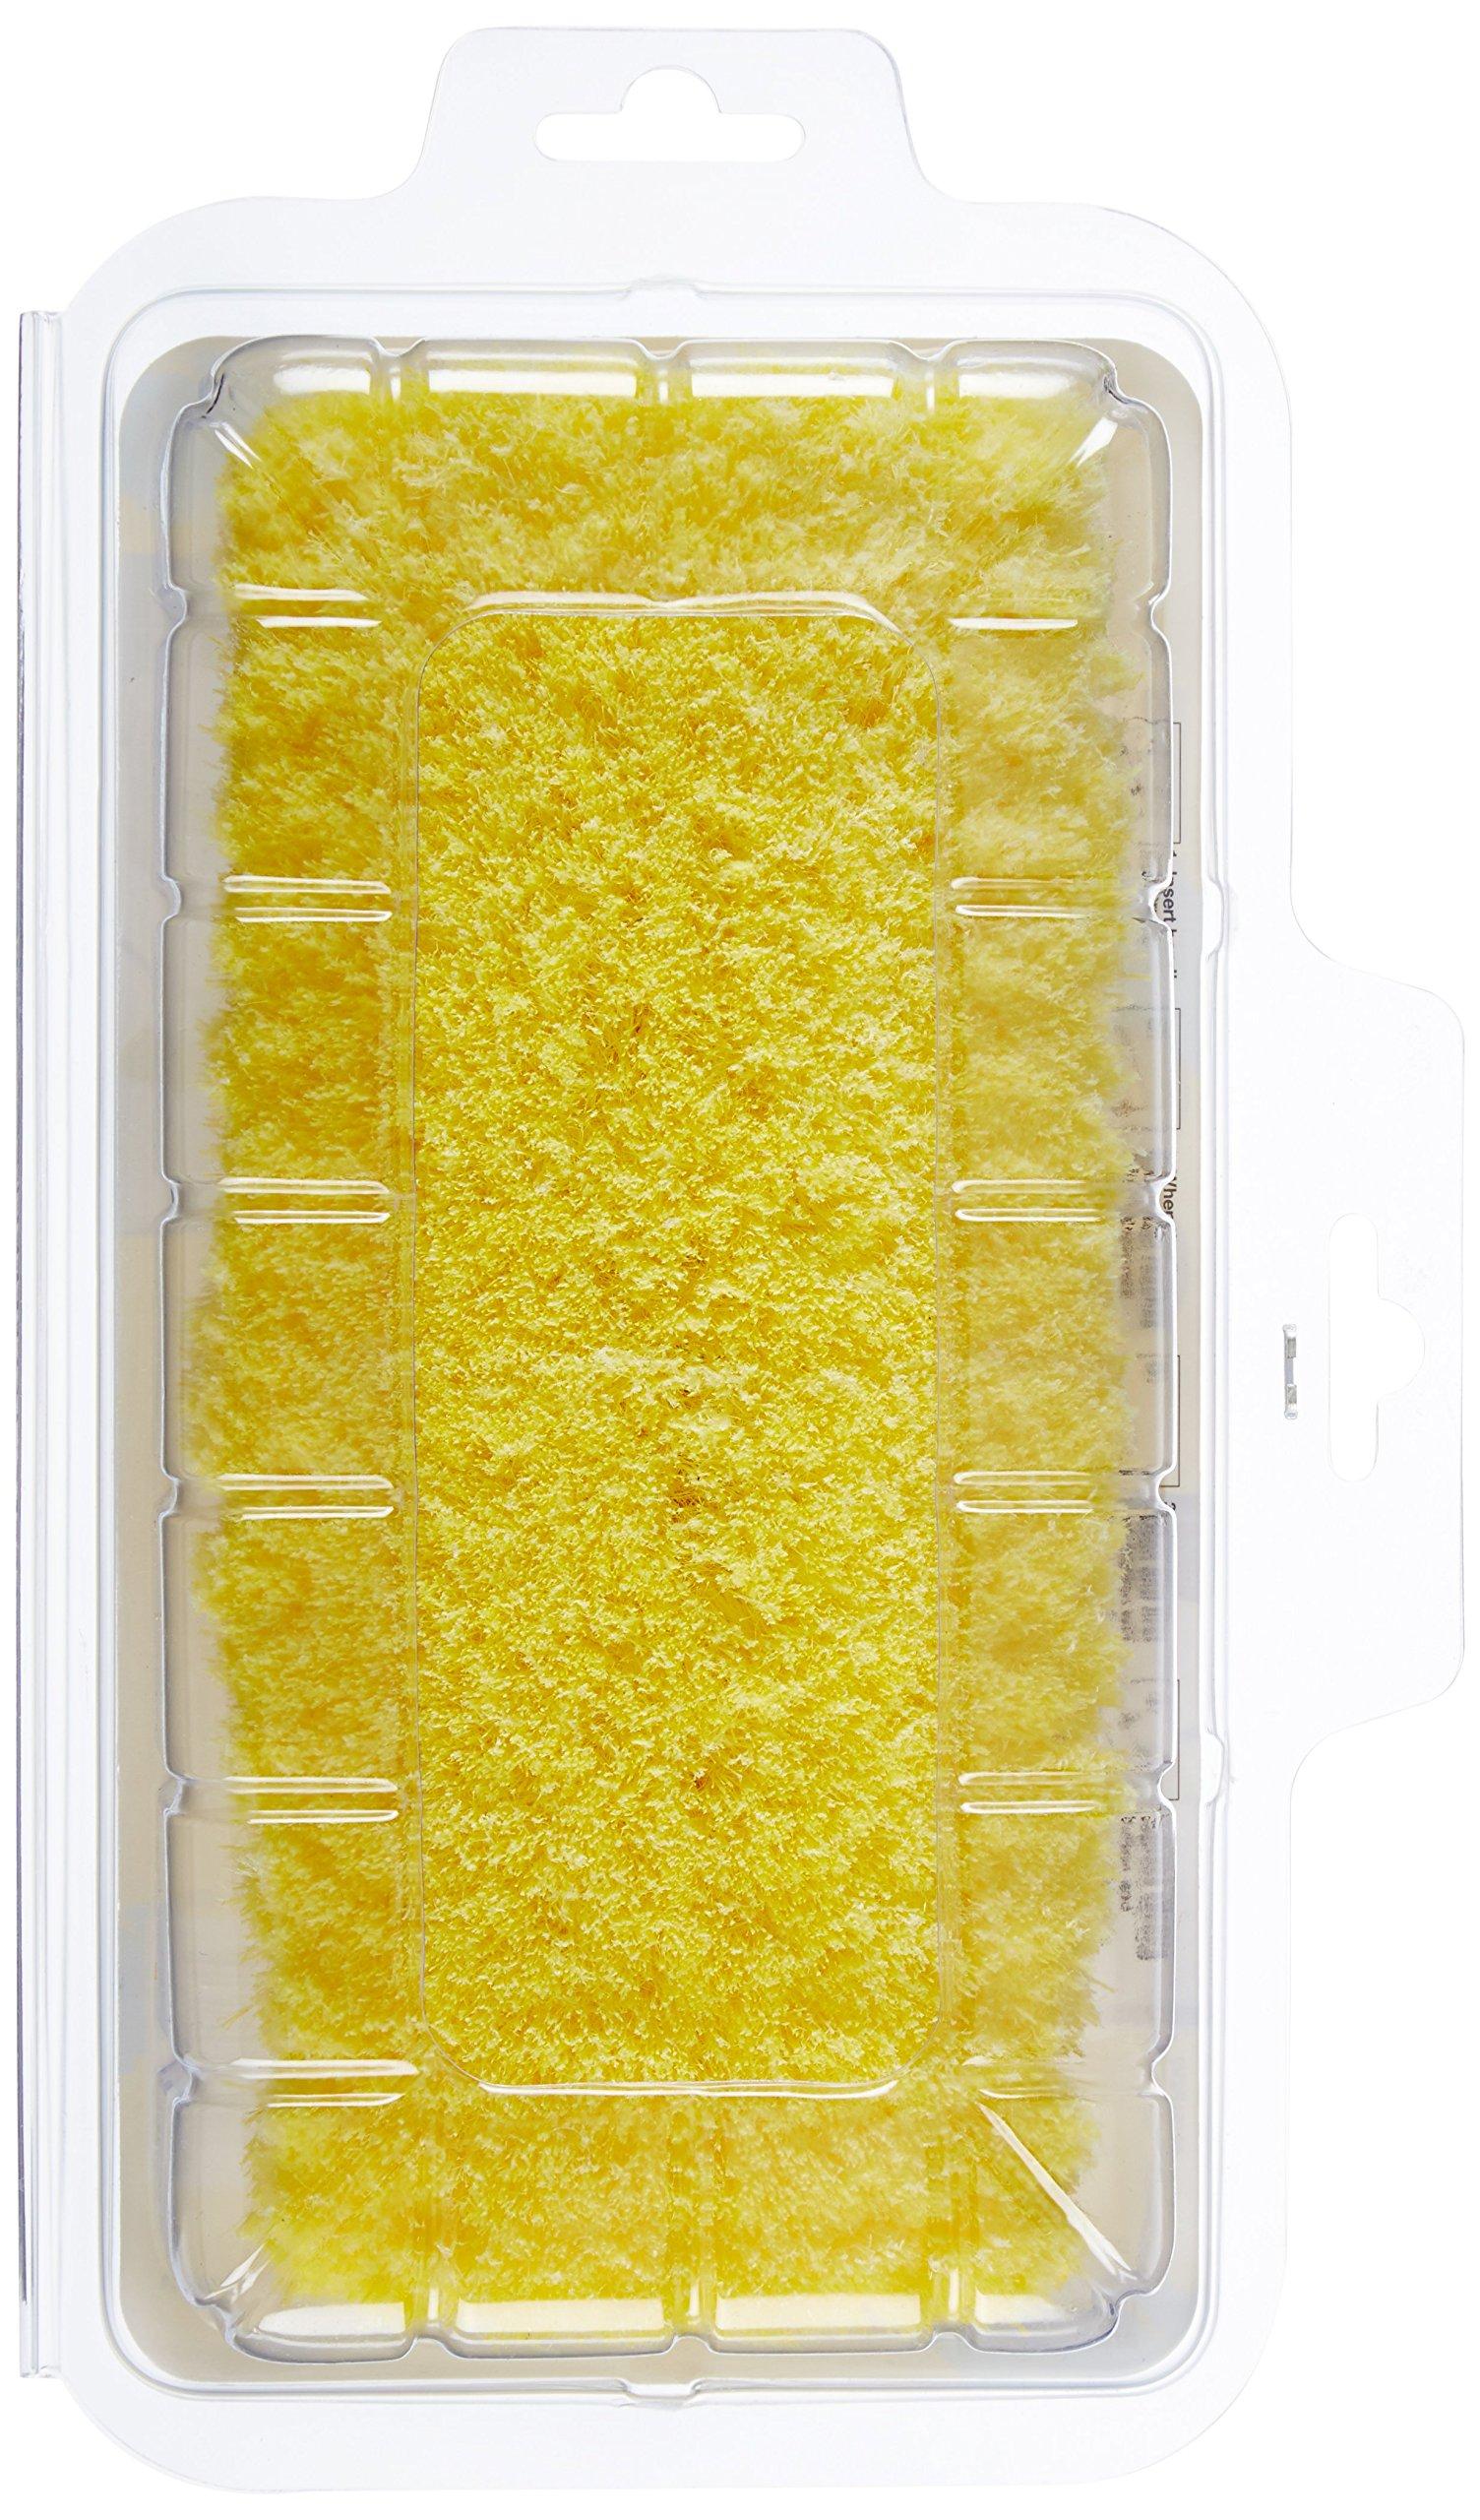 Star brite Soft Premium Wash Brush by Star Brite (Image #3)